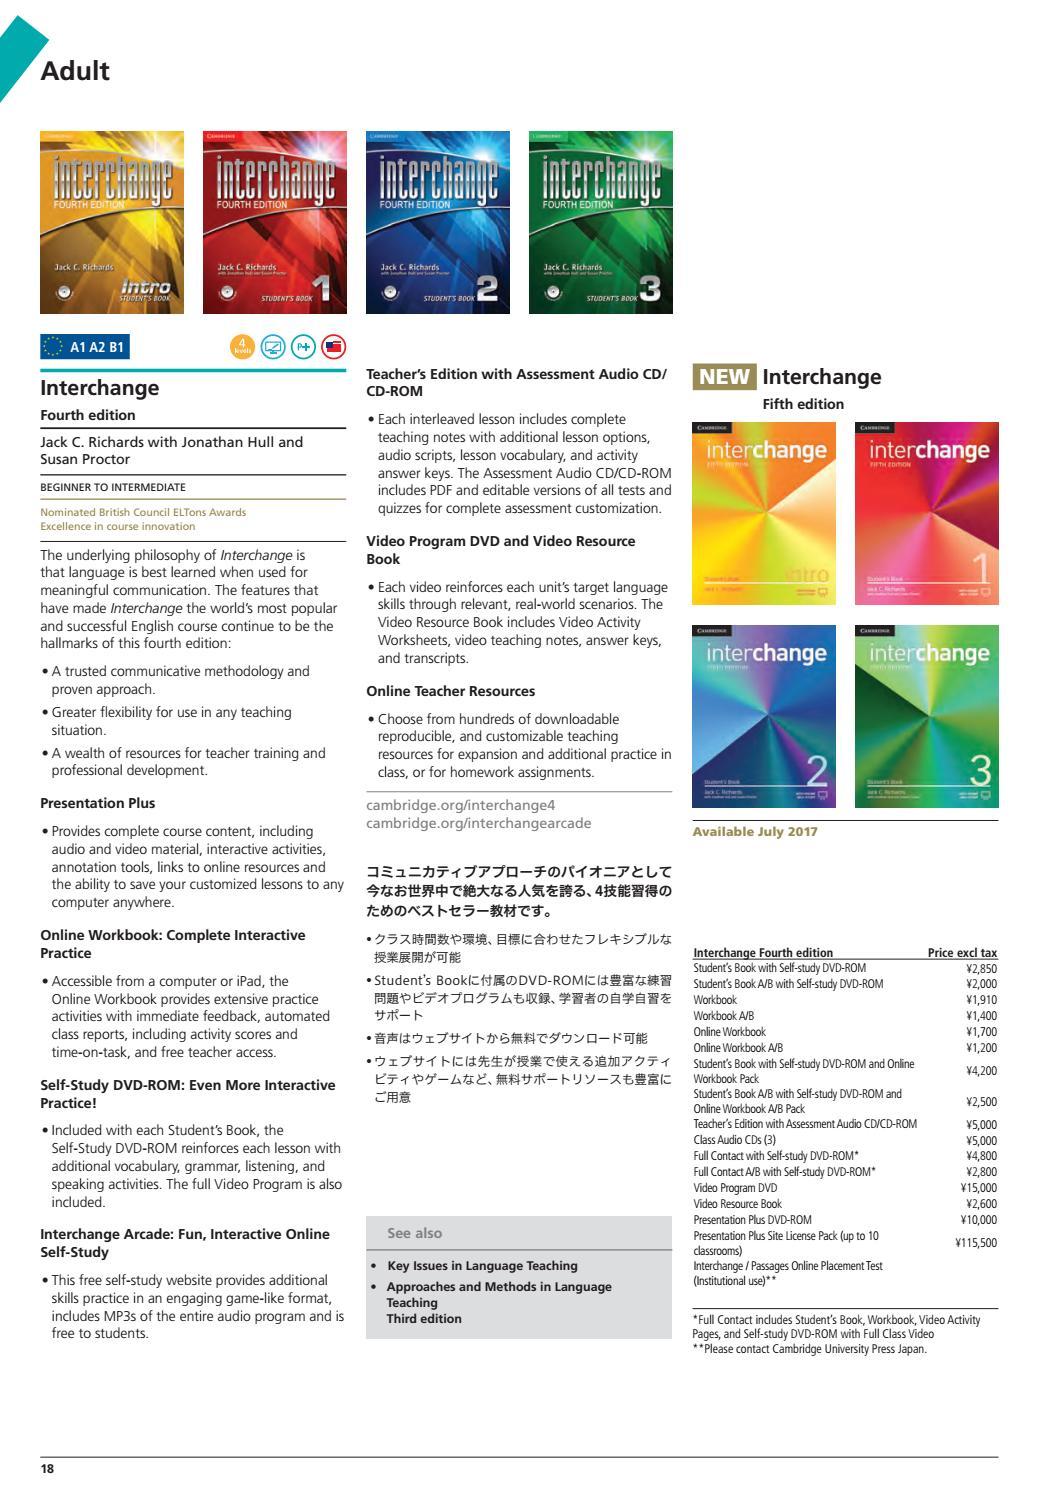 Workbooks interchange fourth edition online workbook : 2017 ELT Cambridge University Press catalogue - Japan by Cambridge ...